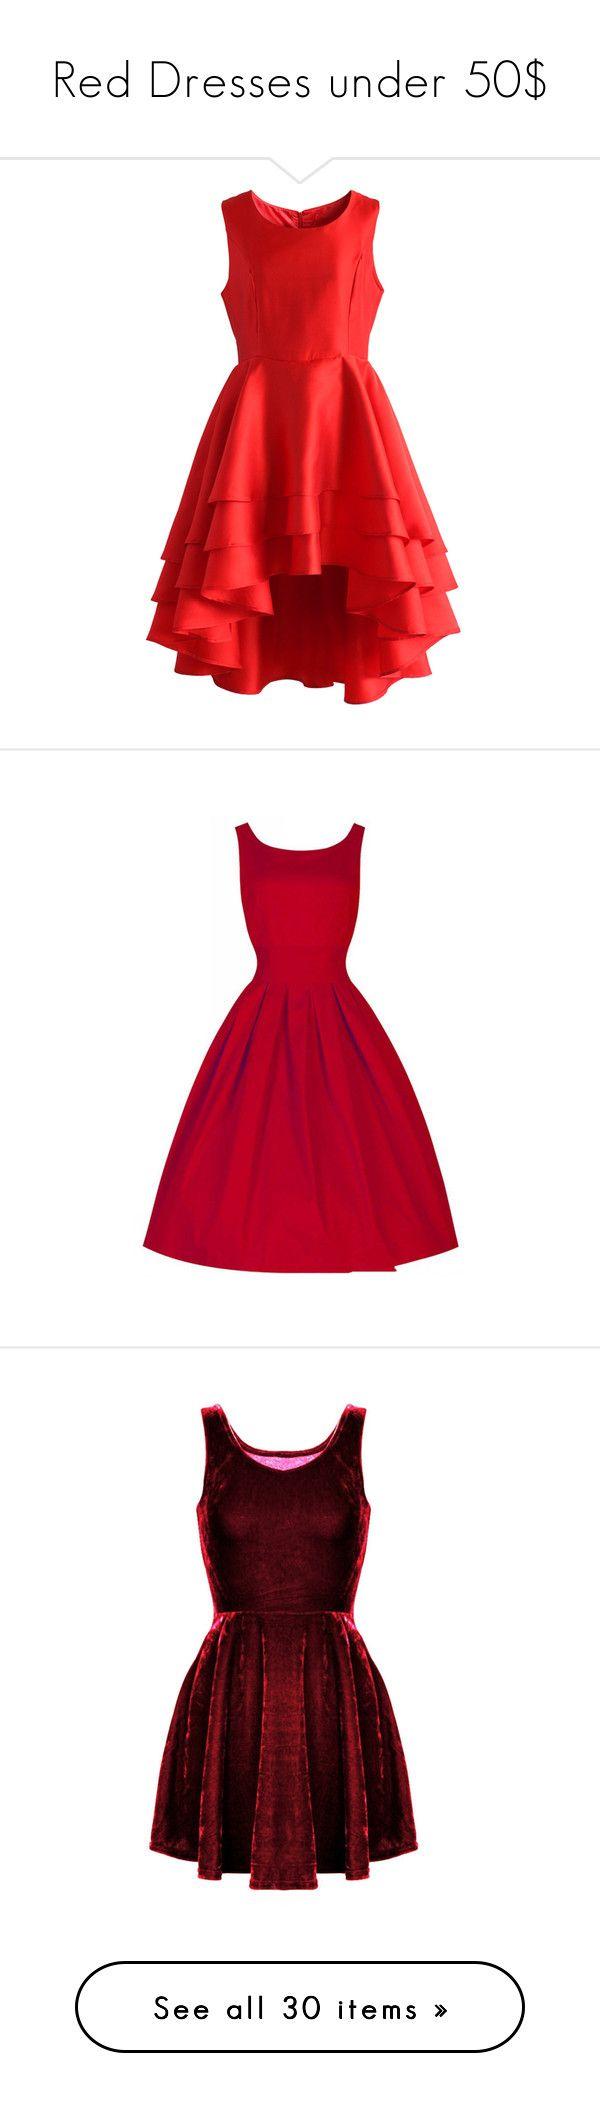 7 best Affordable Prom Dresses Under 50 US Dollar images on ...